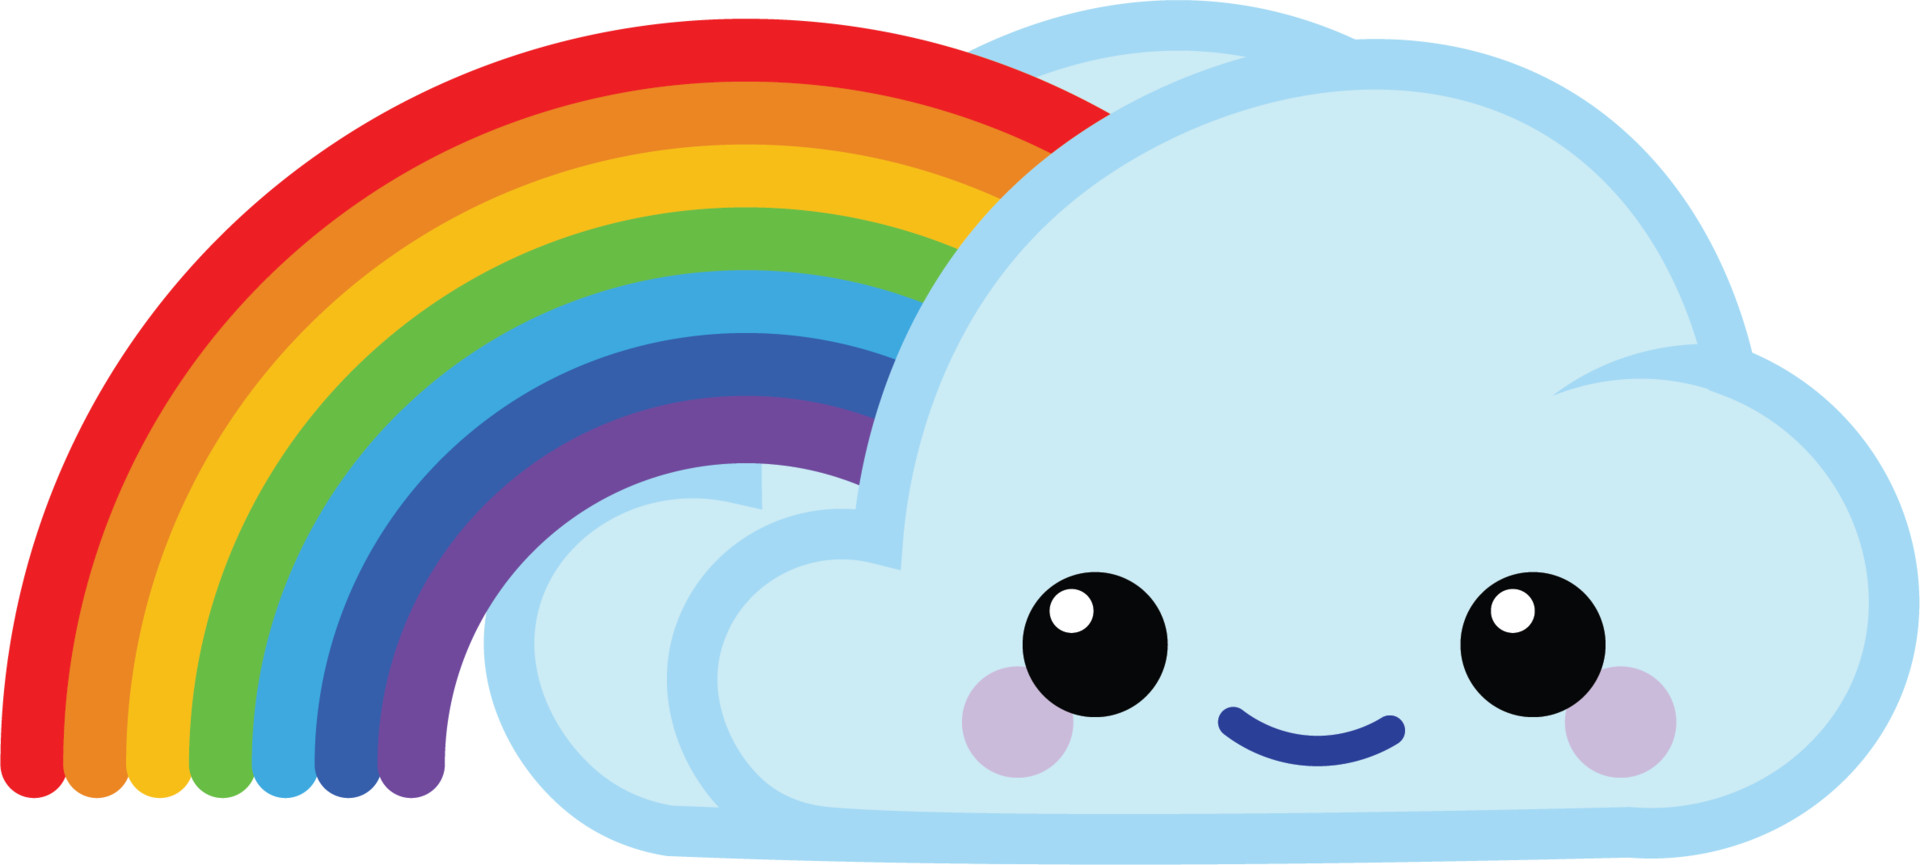 Glenn melenhorst happy cloud rainbow